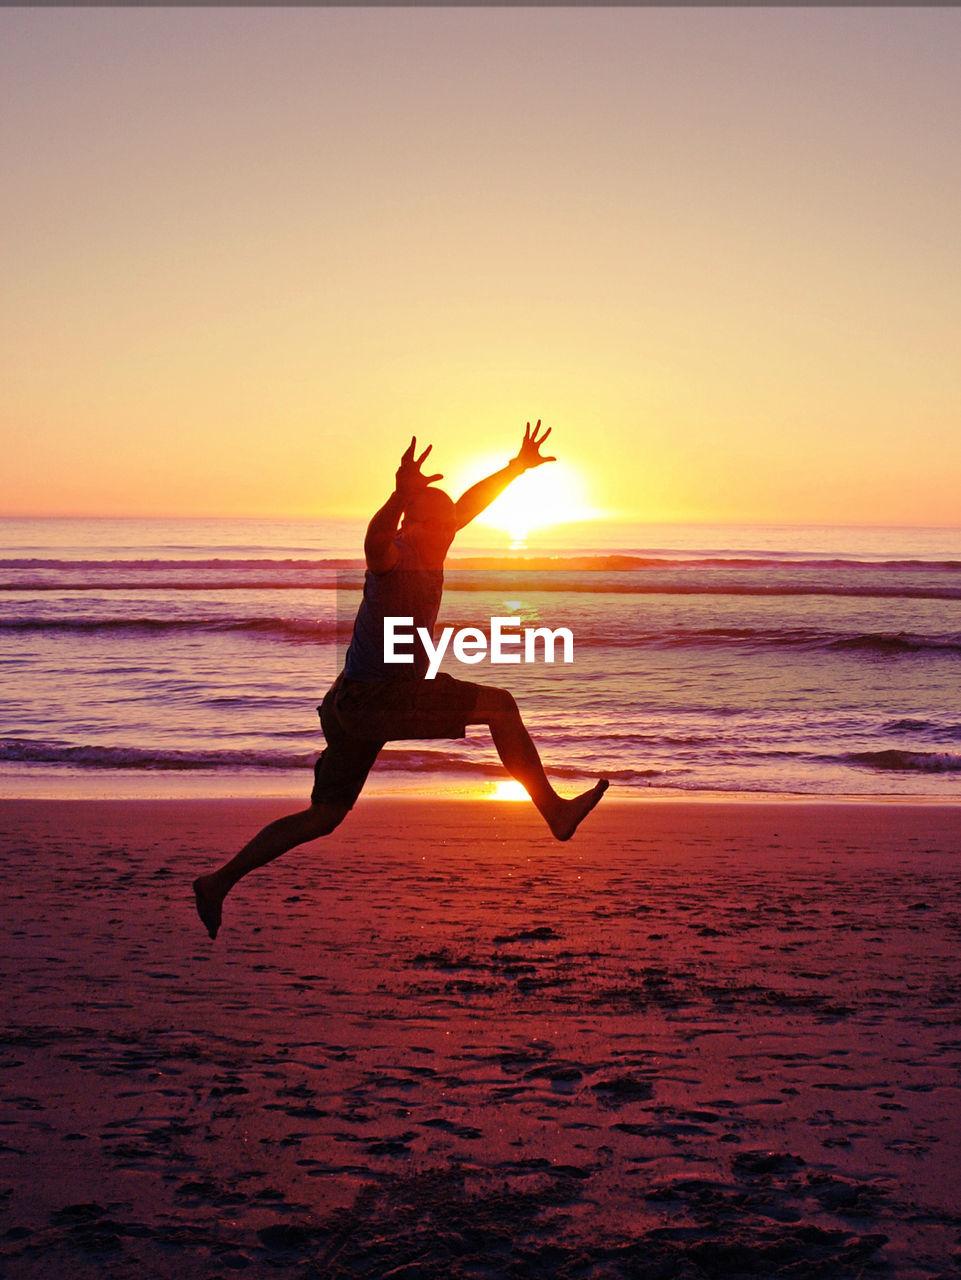 Man leaping into air against sun on beach